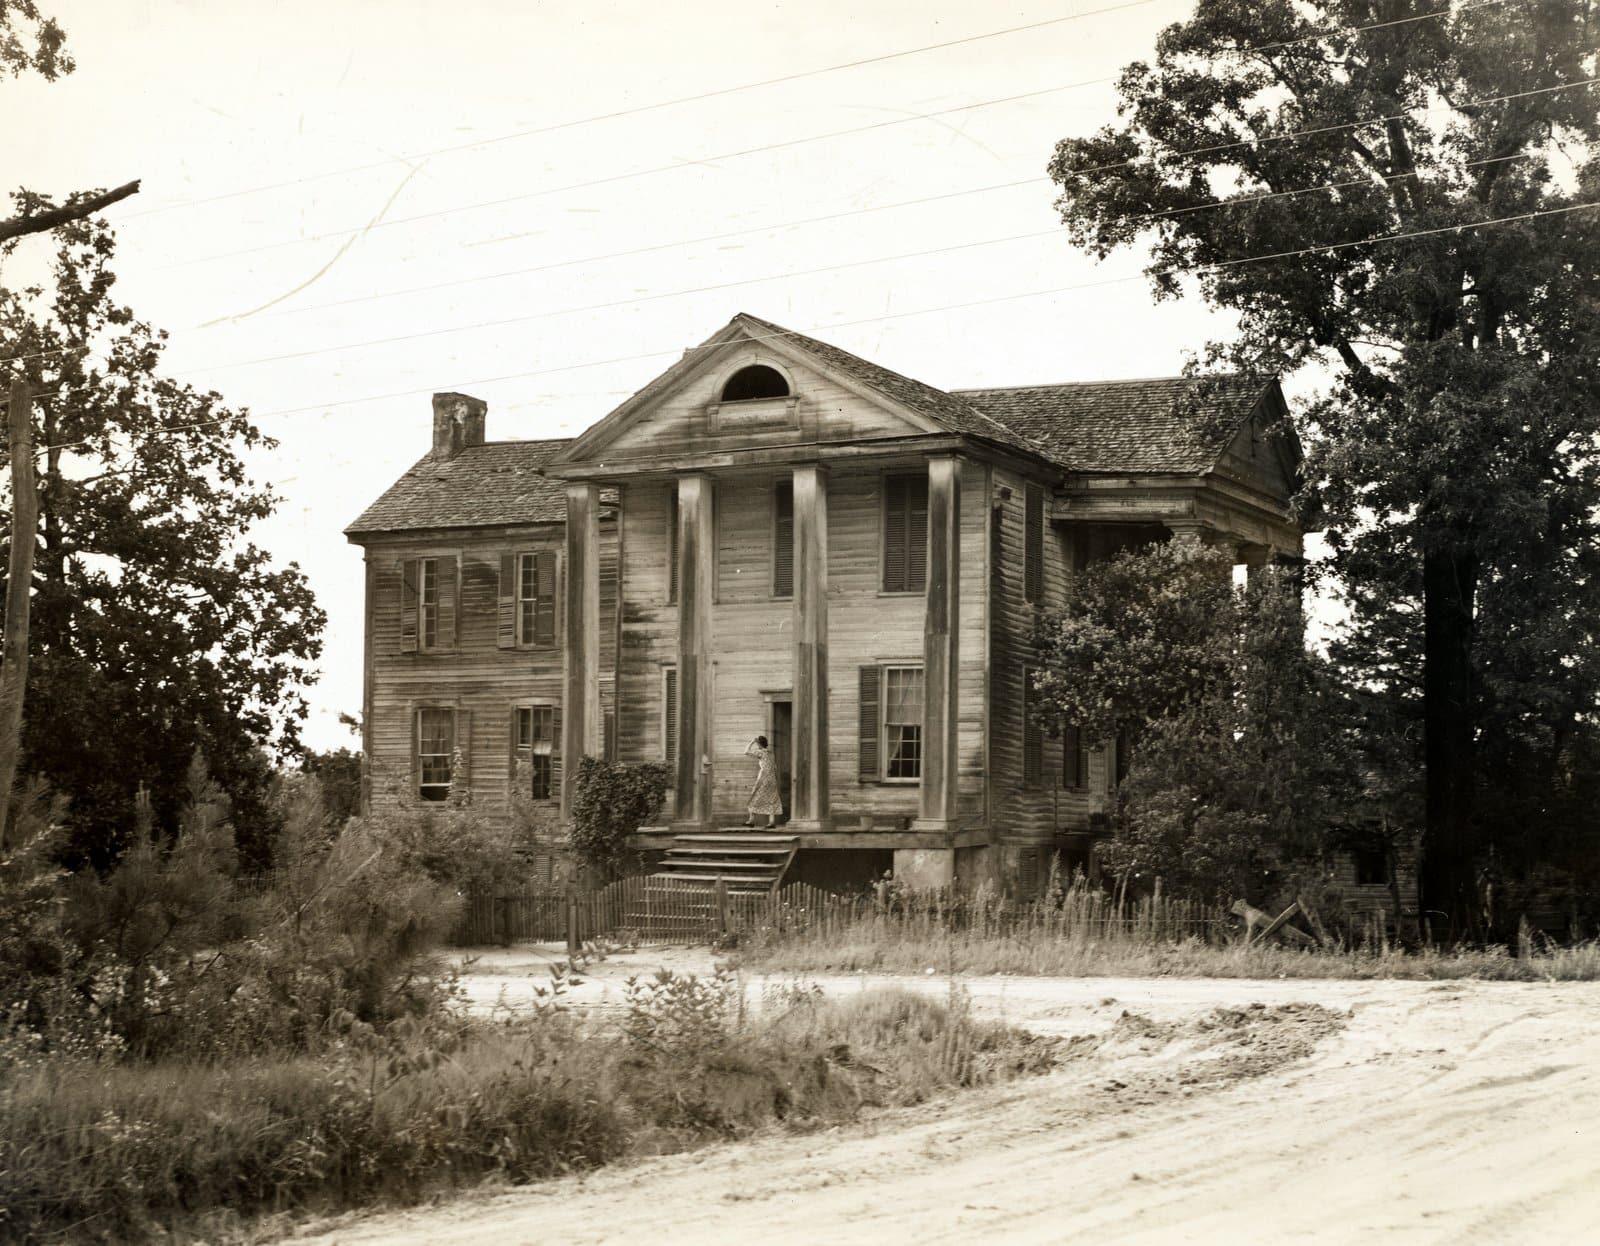 Antebellum plantation - Greene County, Georgia (1937)